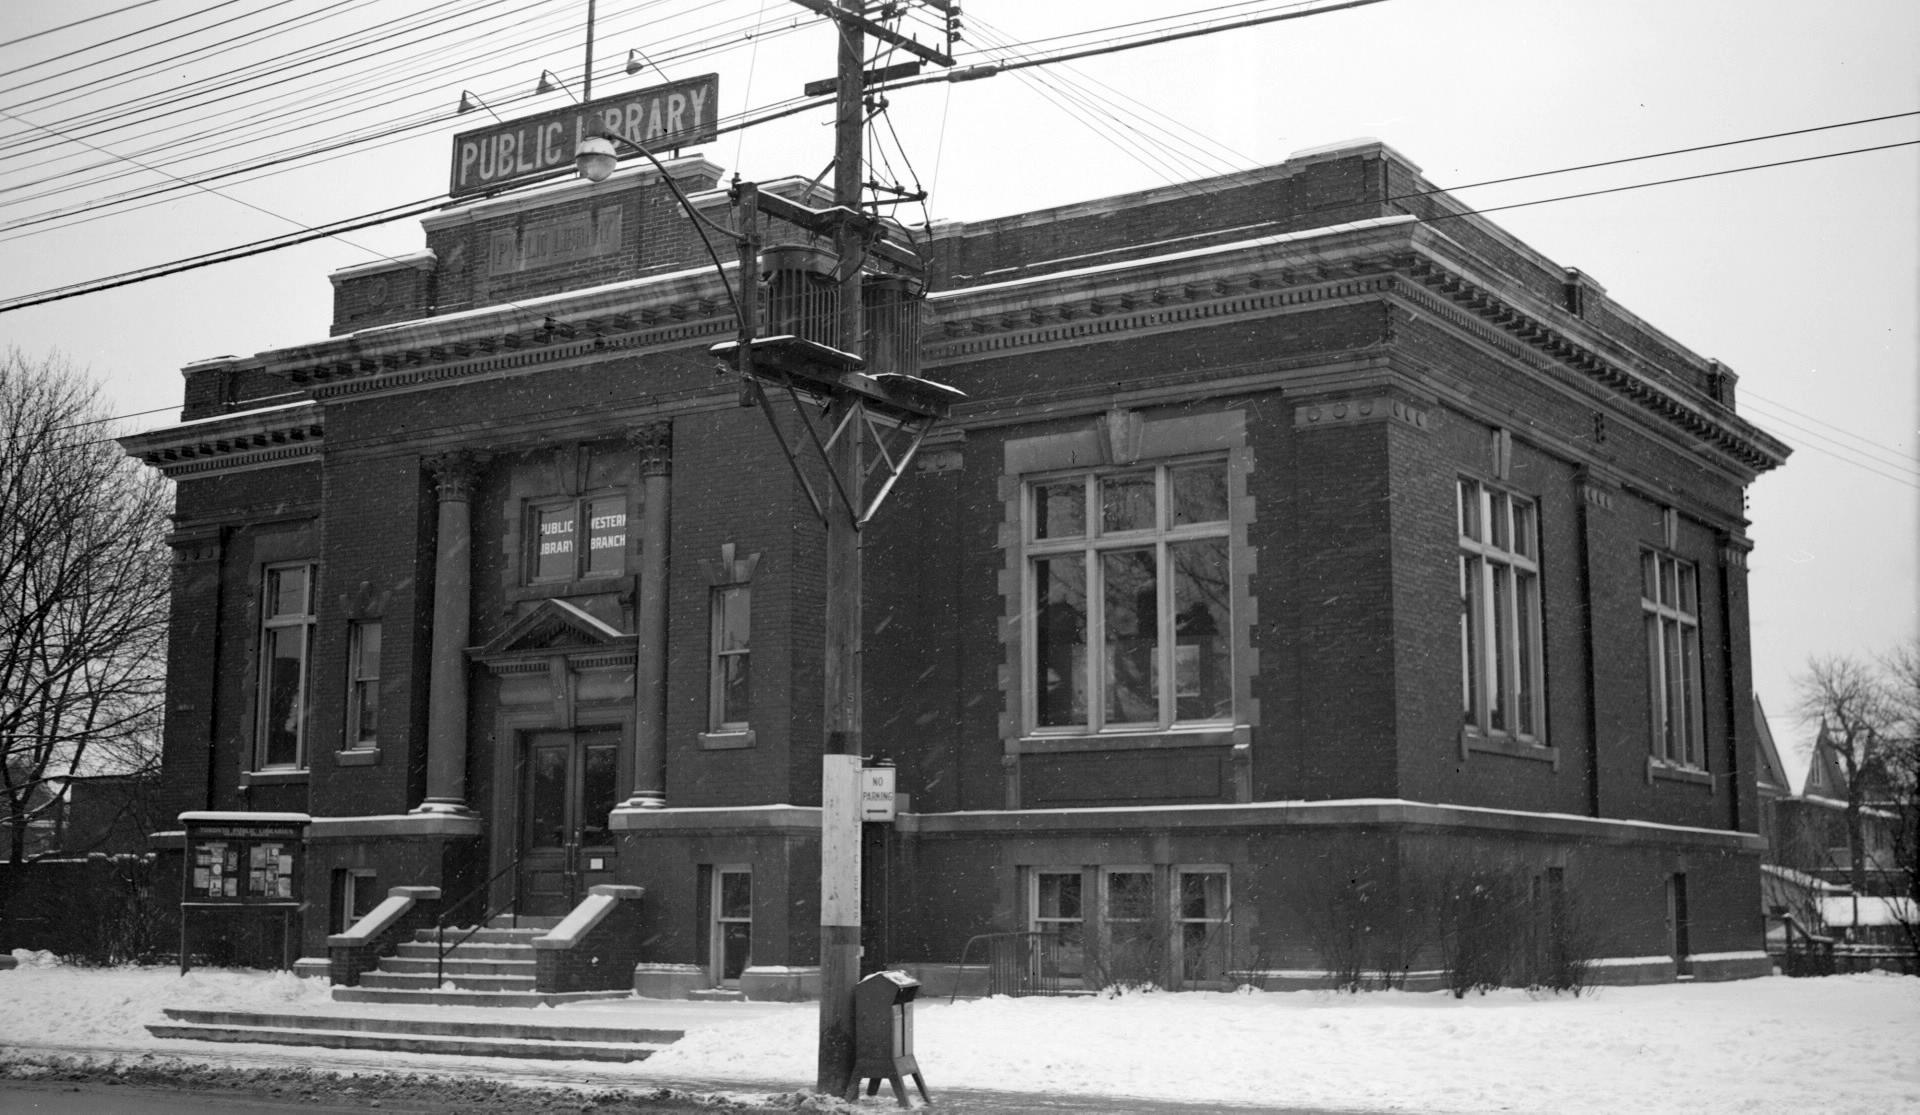 Annette Branch, 1953. Toronto Public Library Digital Archive.